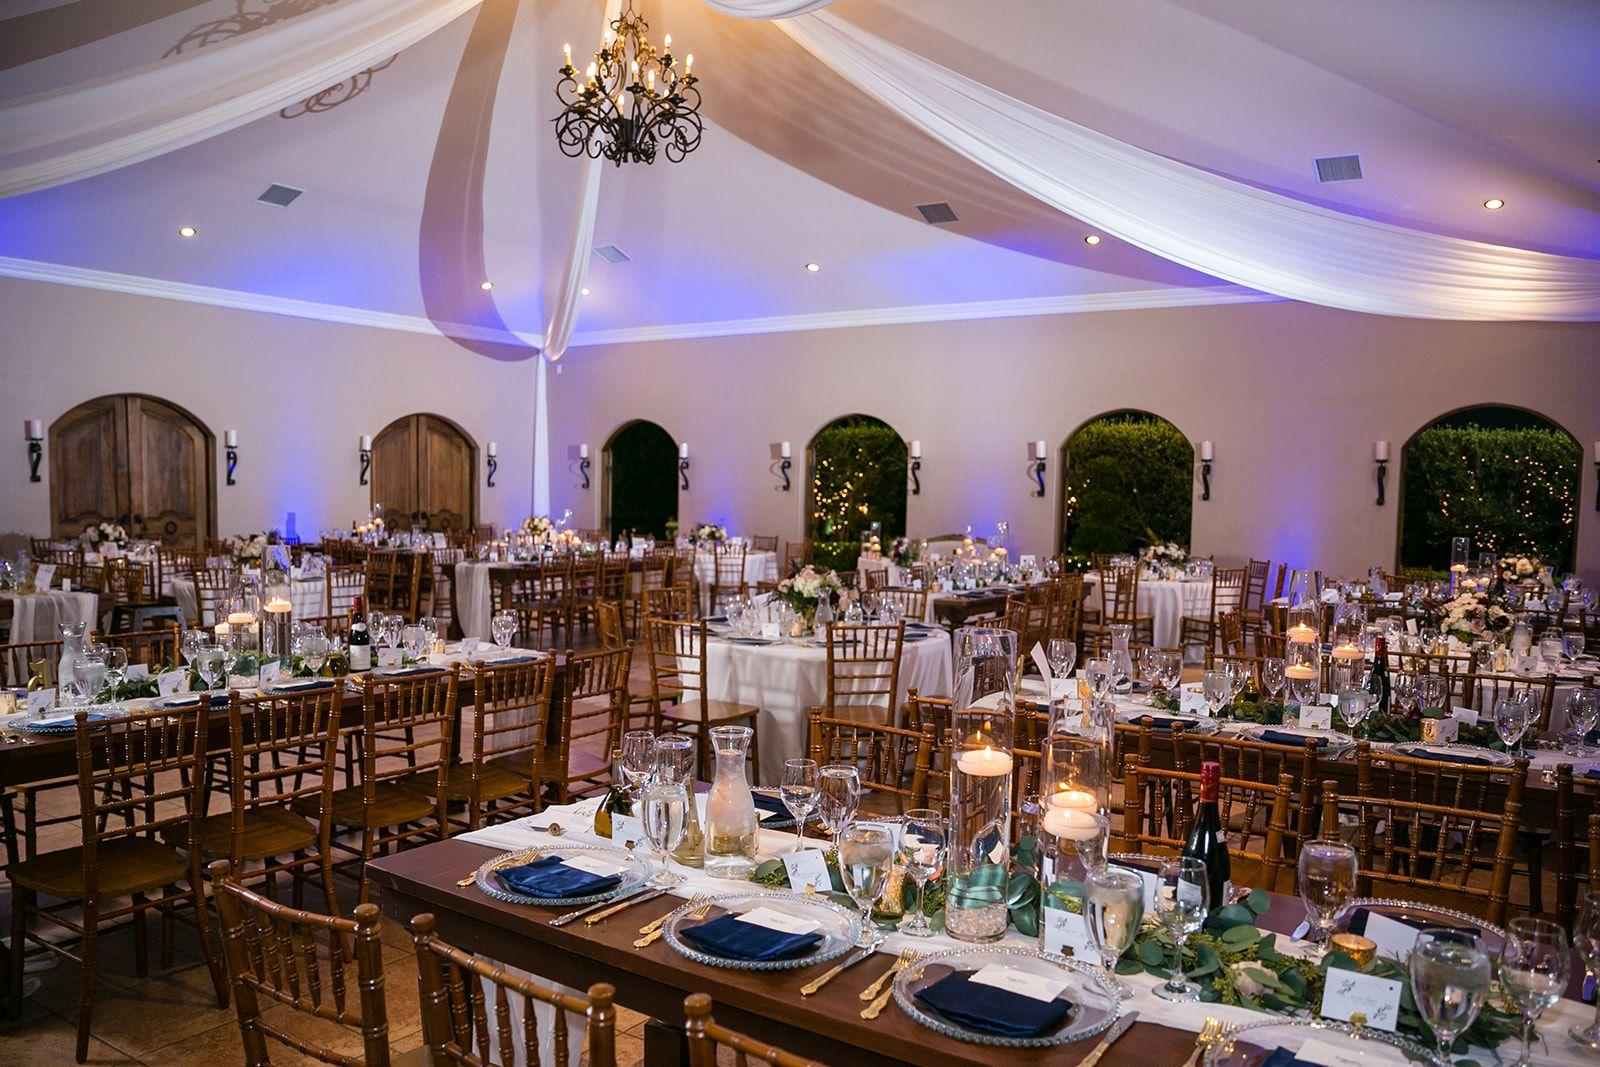 Reception Site Villa De Amore Wedding Venue In Temecula Cal California Wedding Venues Wedding Photography And Videography Orange County Wedding Photographer